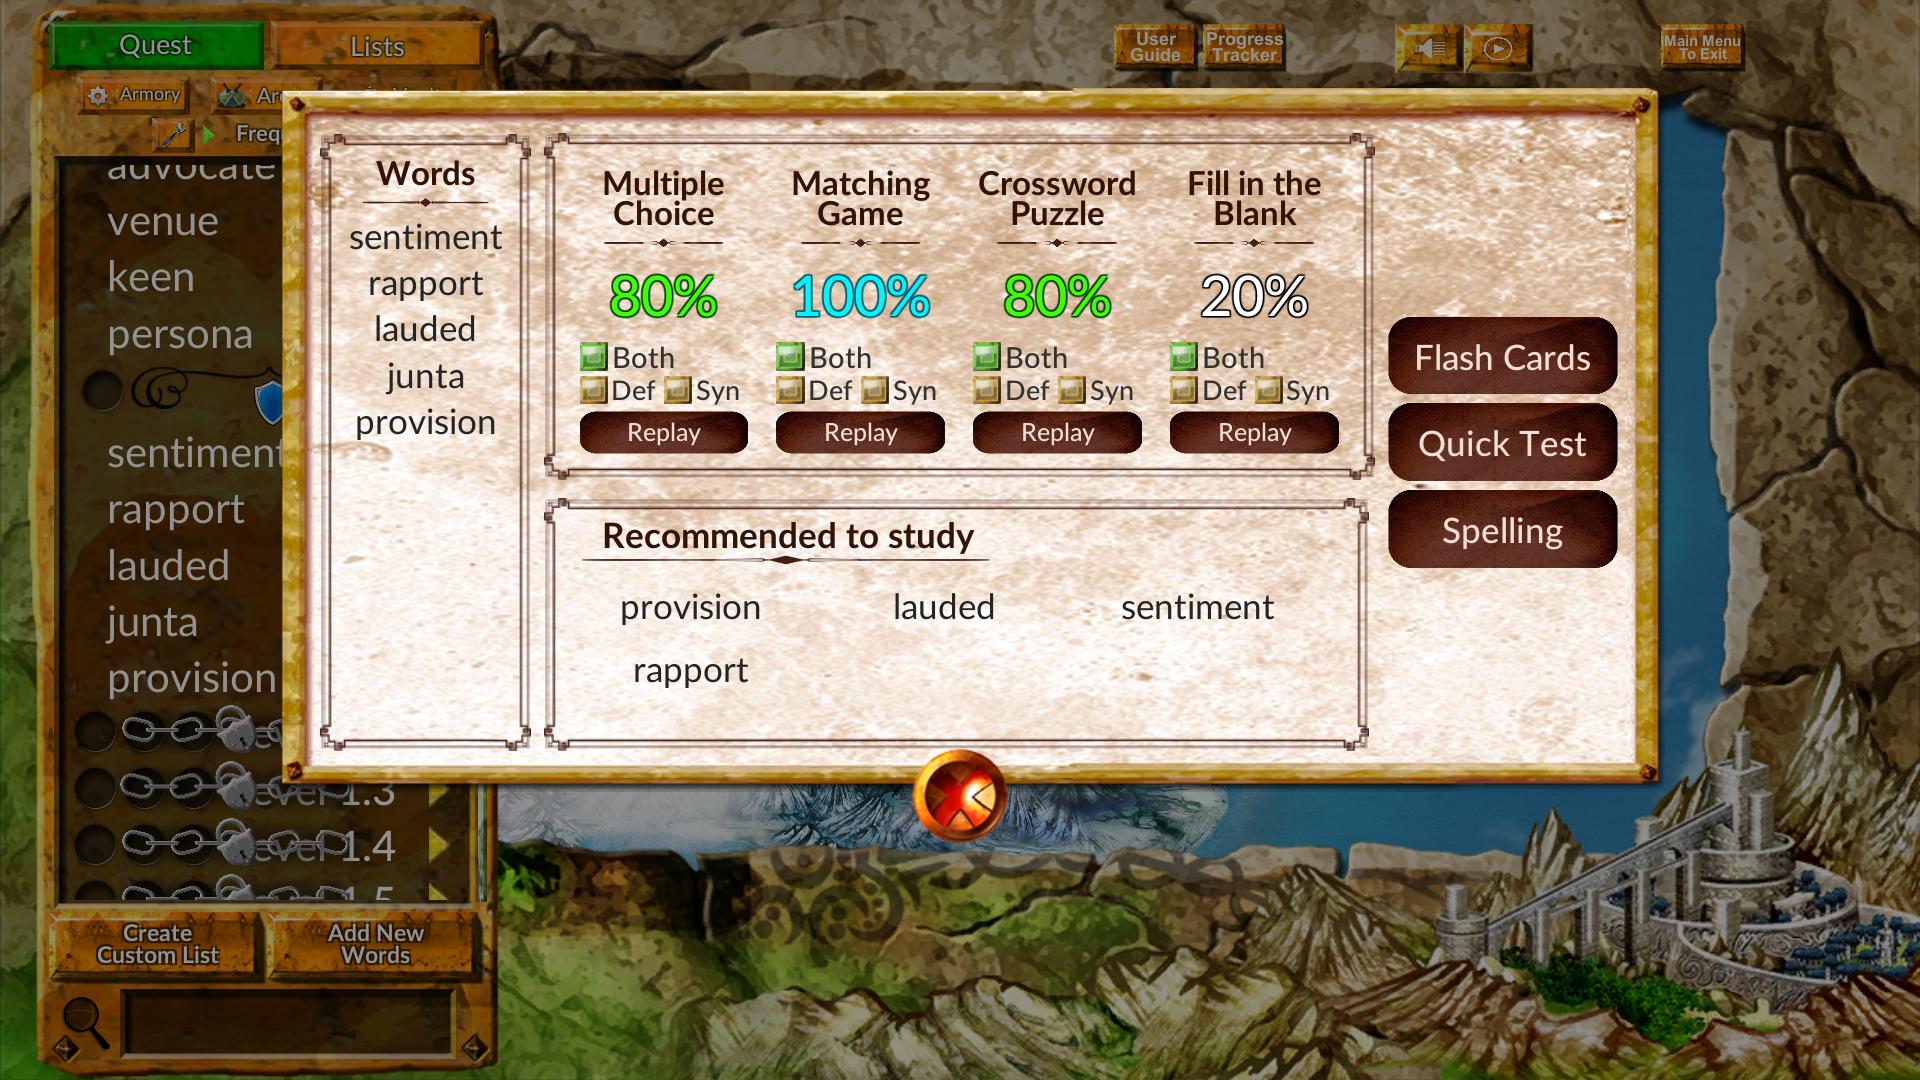 Hobby, Educational & Fun Software, Vocabulary Quest Screenshot